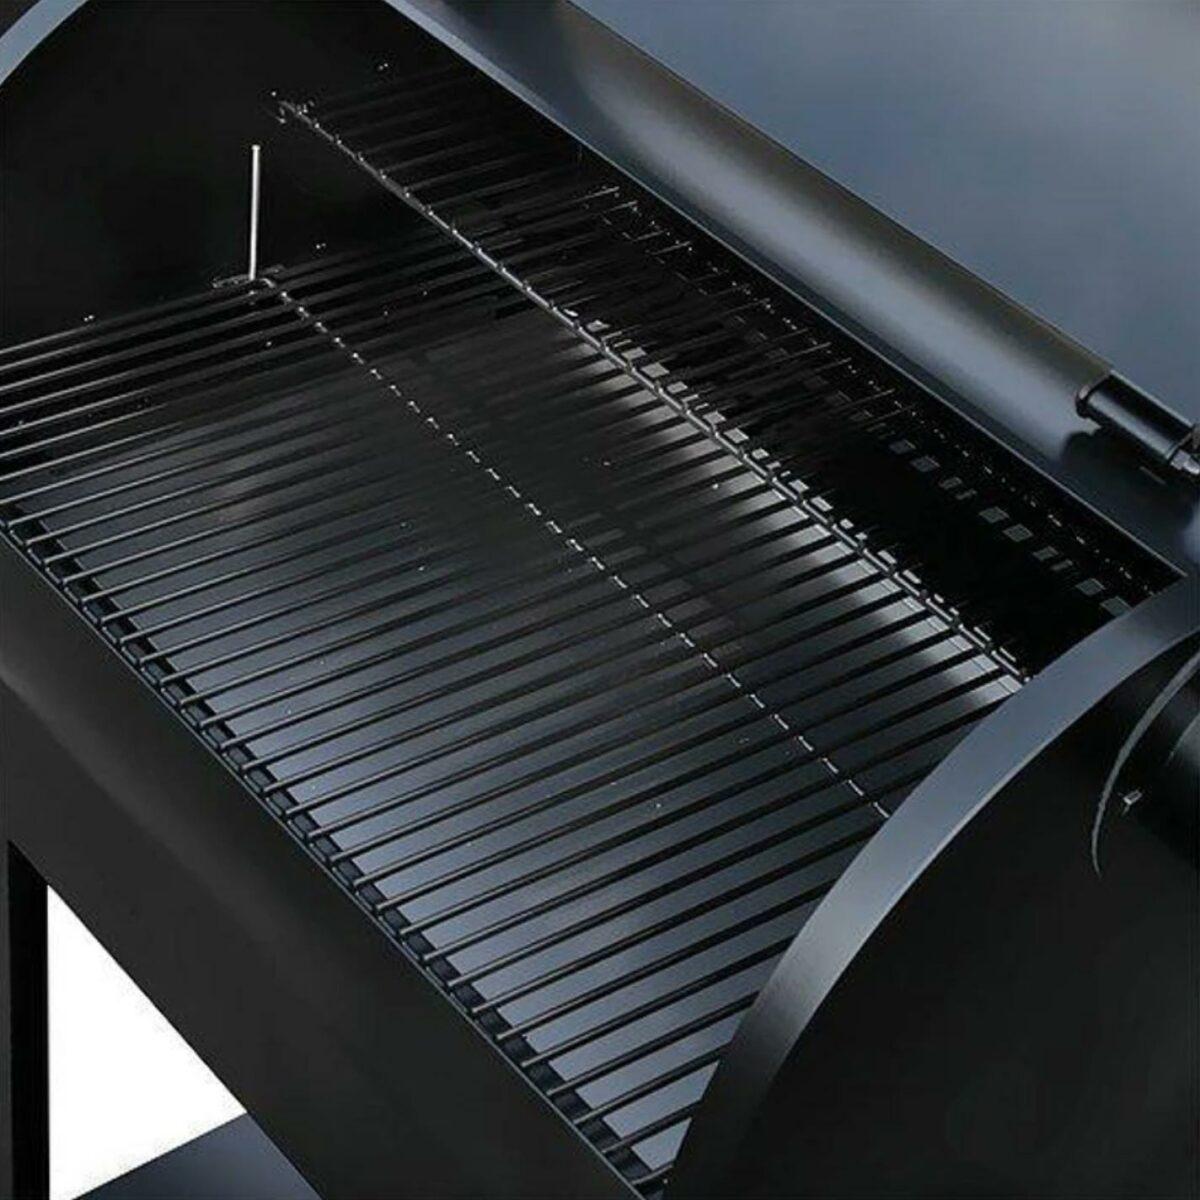 grill barbecue pellet zgrills 700